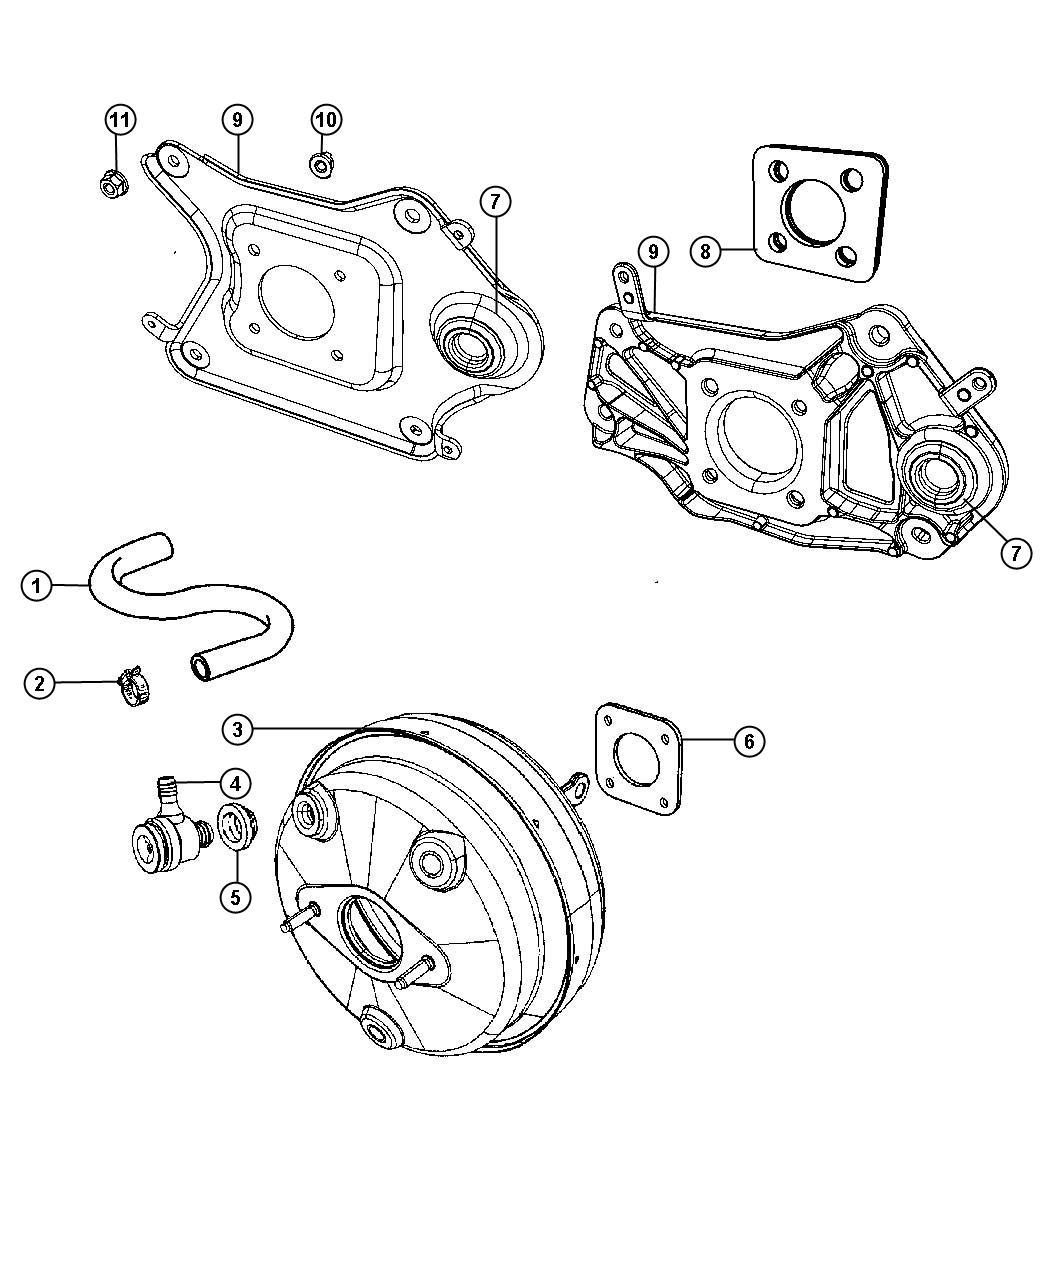 Jeep Liberty Booster Power Brake Maintenance